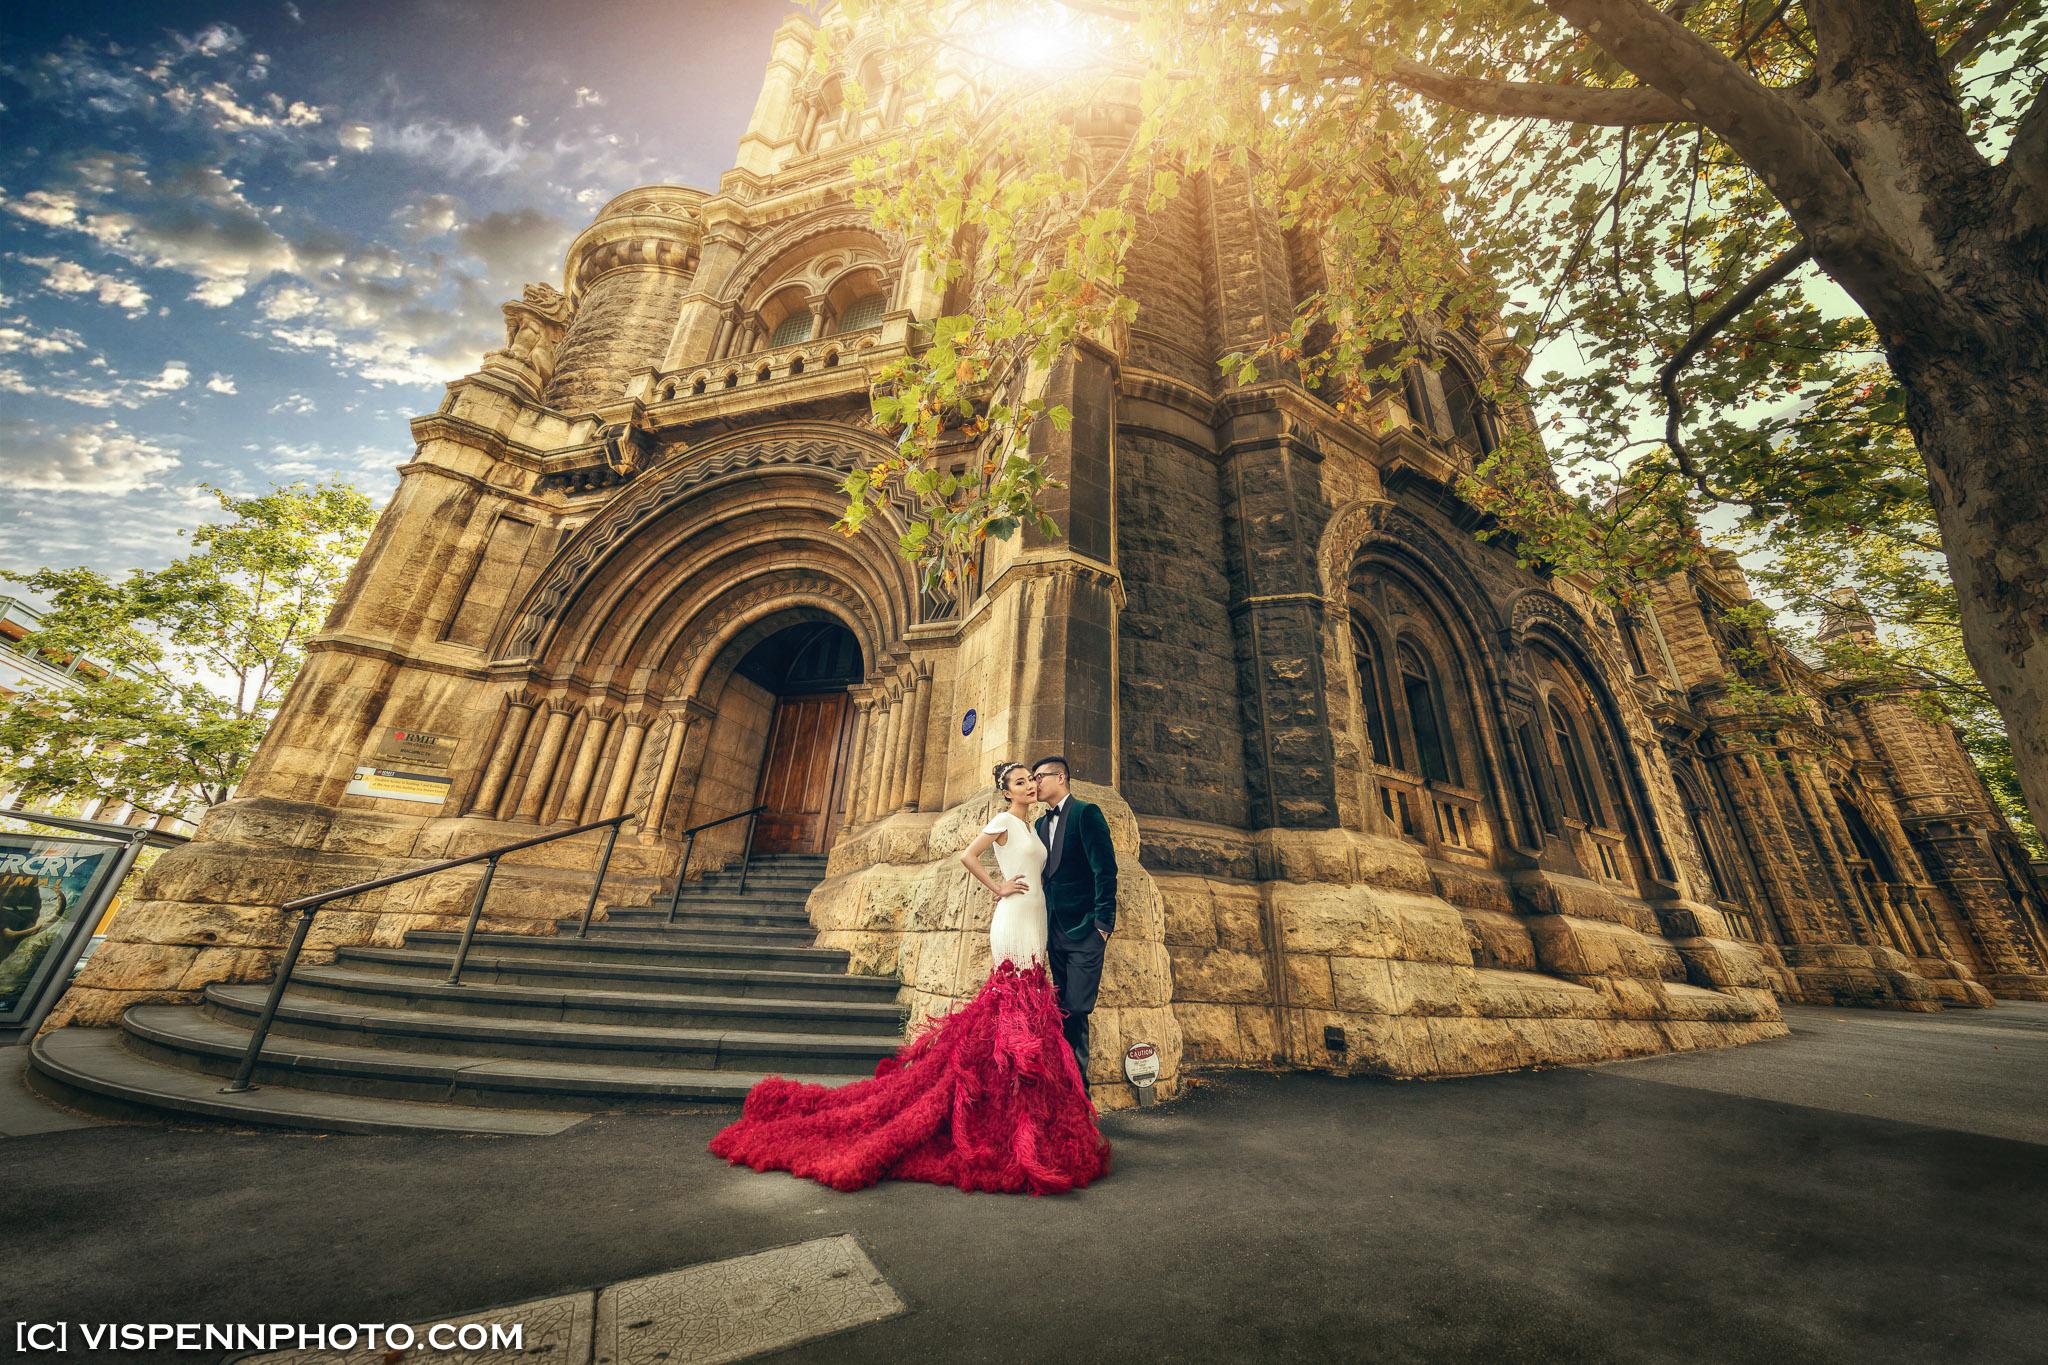 PRE WEDDING Photography Melbourne ZHPENN StacieYi PreWedding 5843 1